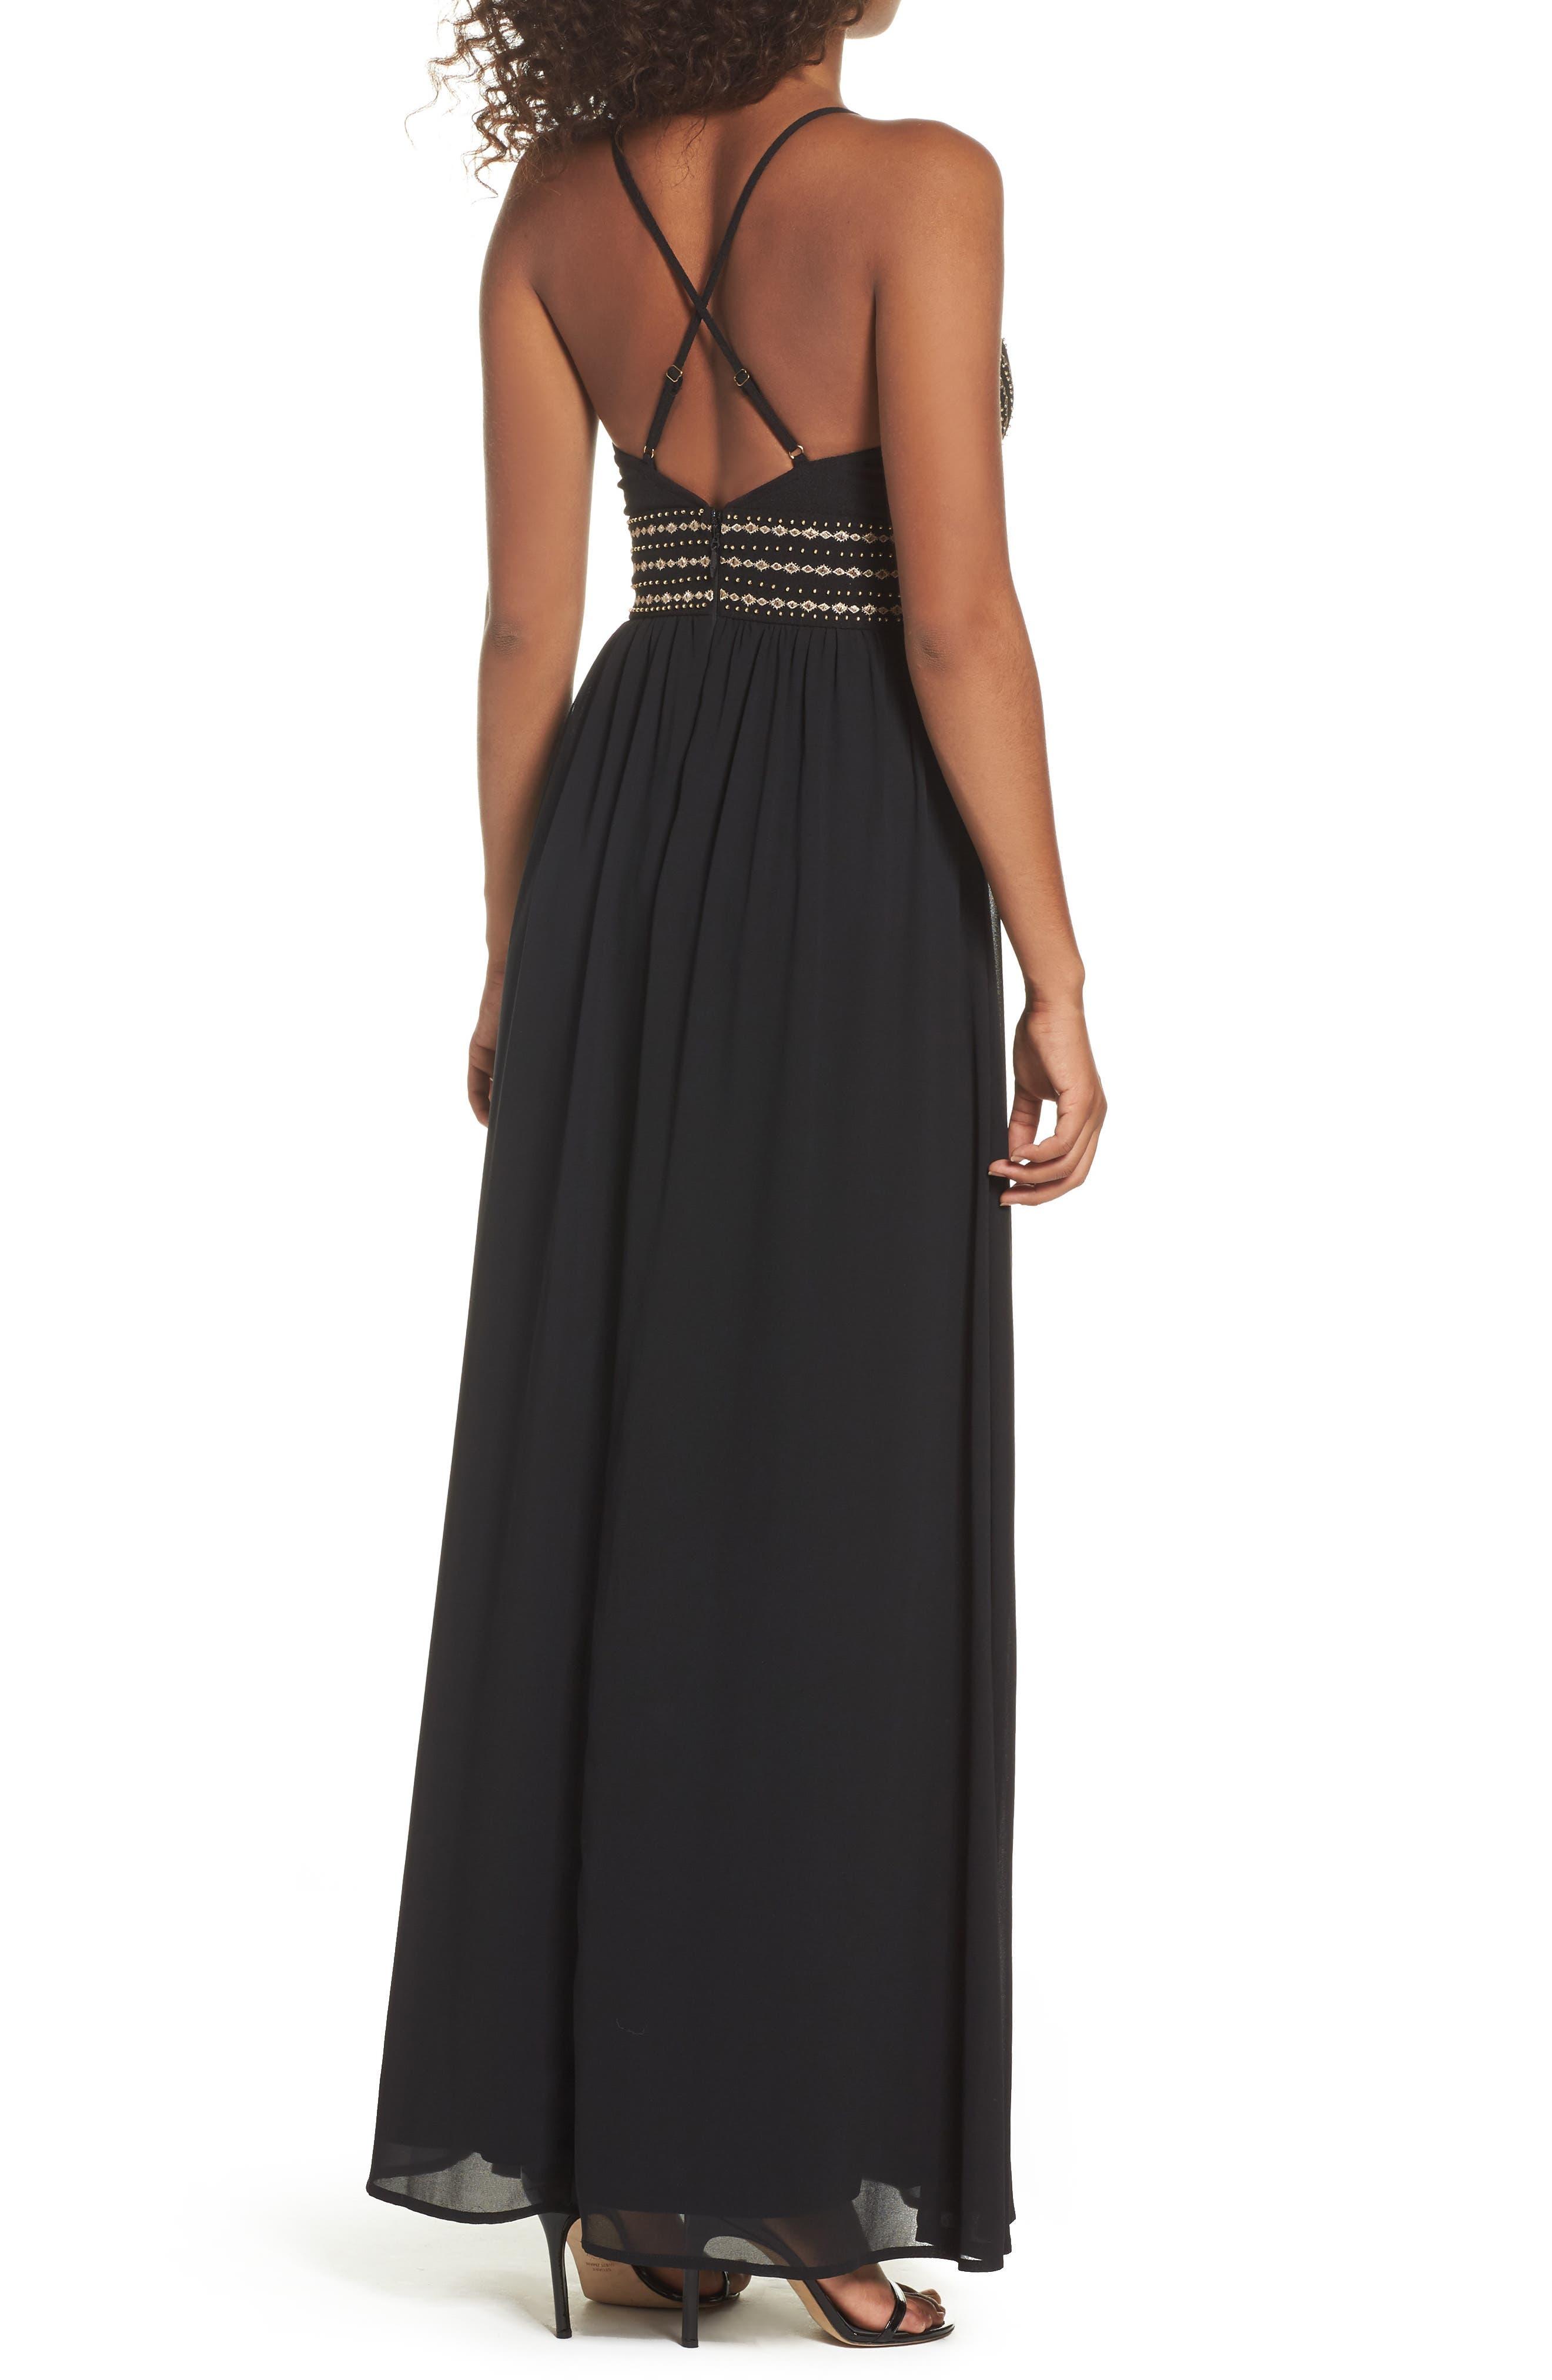 Glamorous Gala Embellished Maxi Dress,                             Alternate thumbnail 2, color,                             BLACK